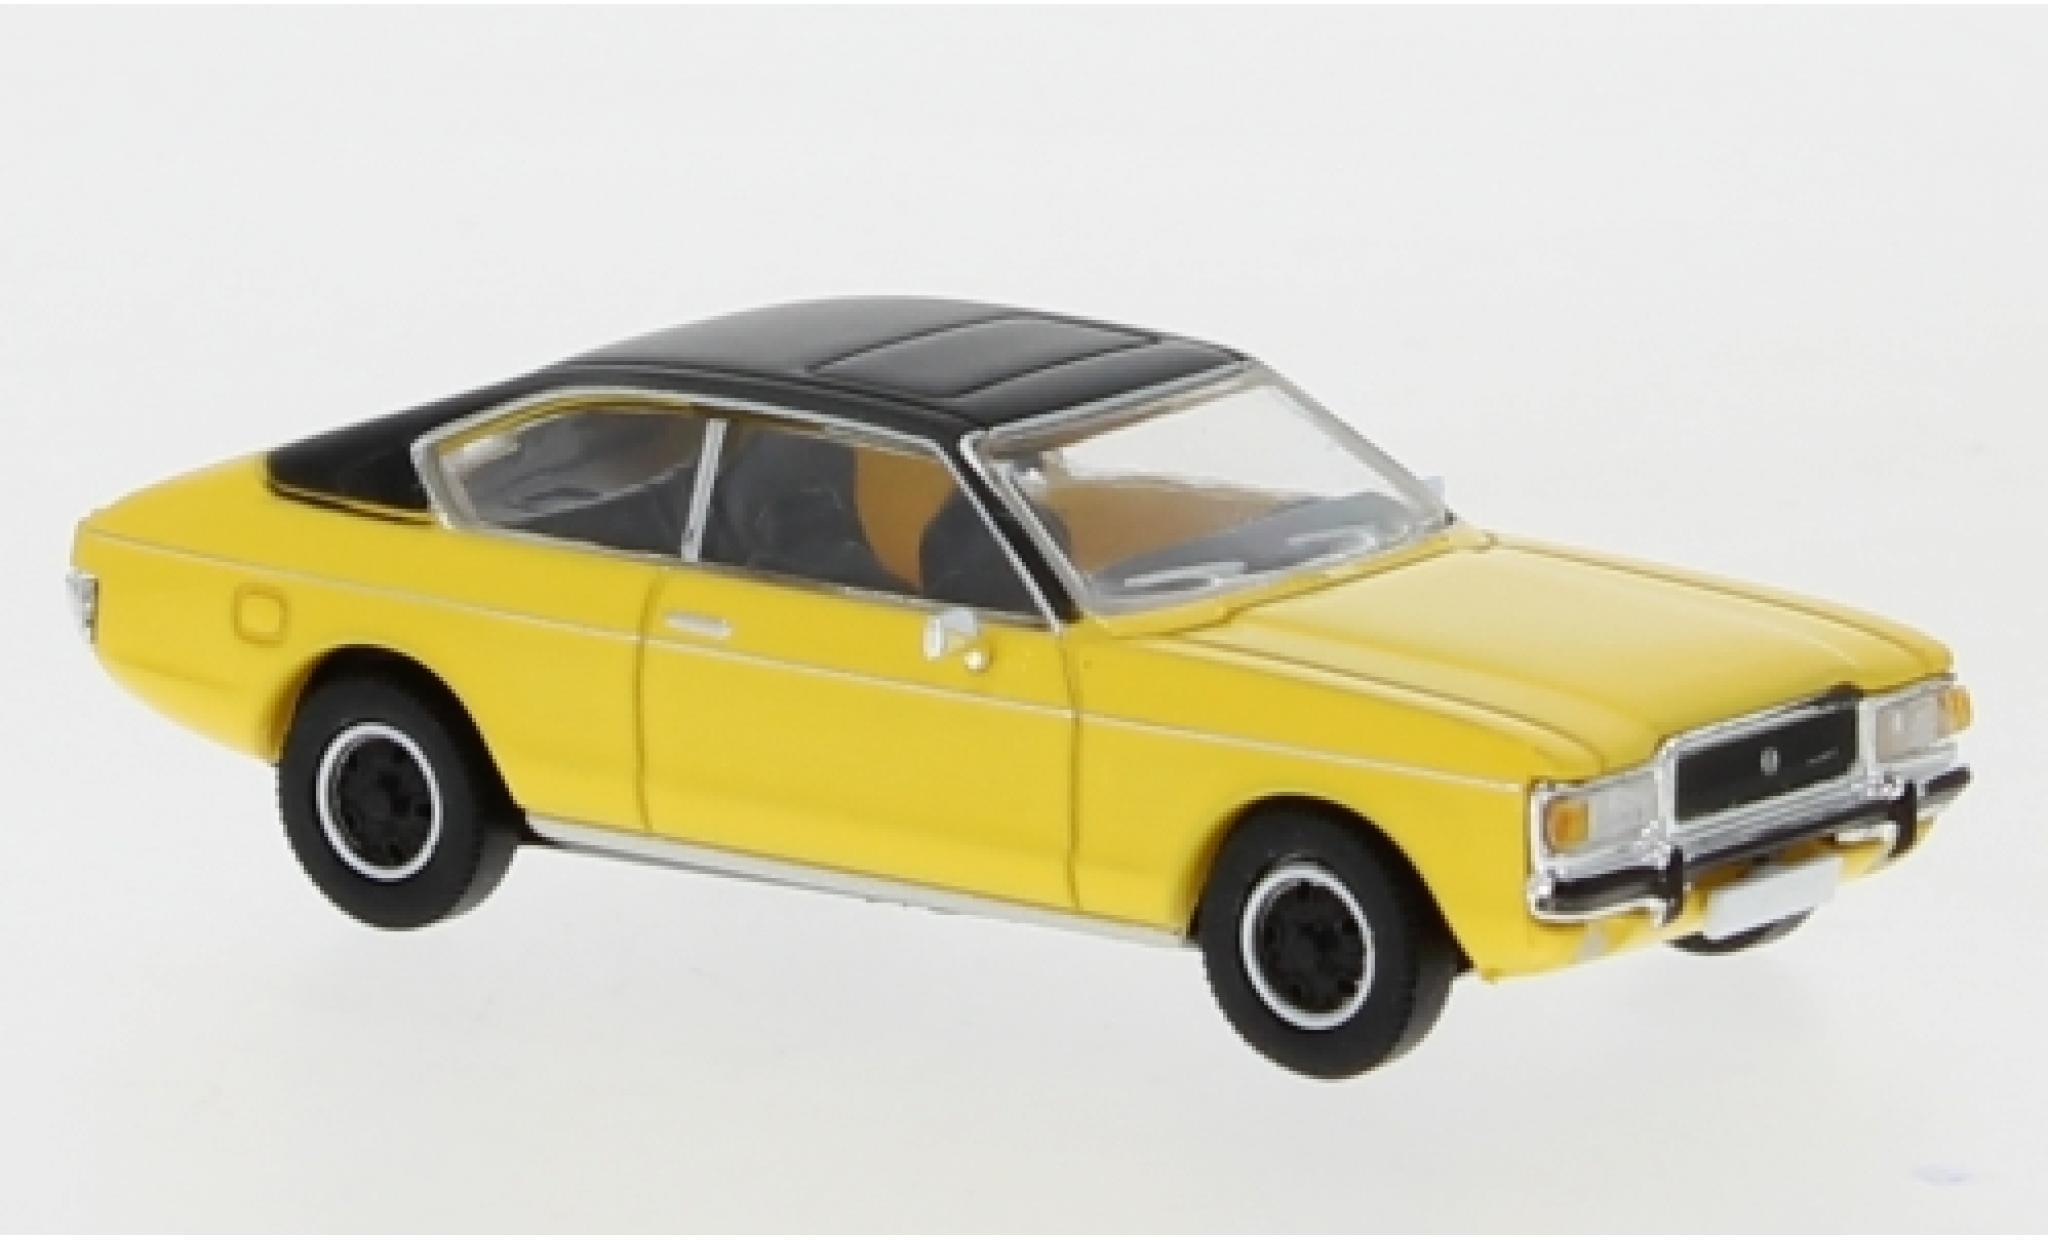 Ford Granada 1/87 Premium ClassiXXs MK I Coupe jaune/matt-noire 1974